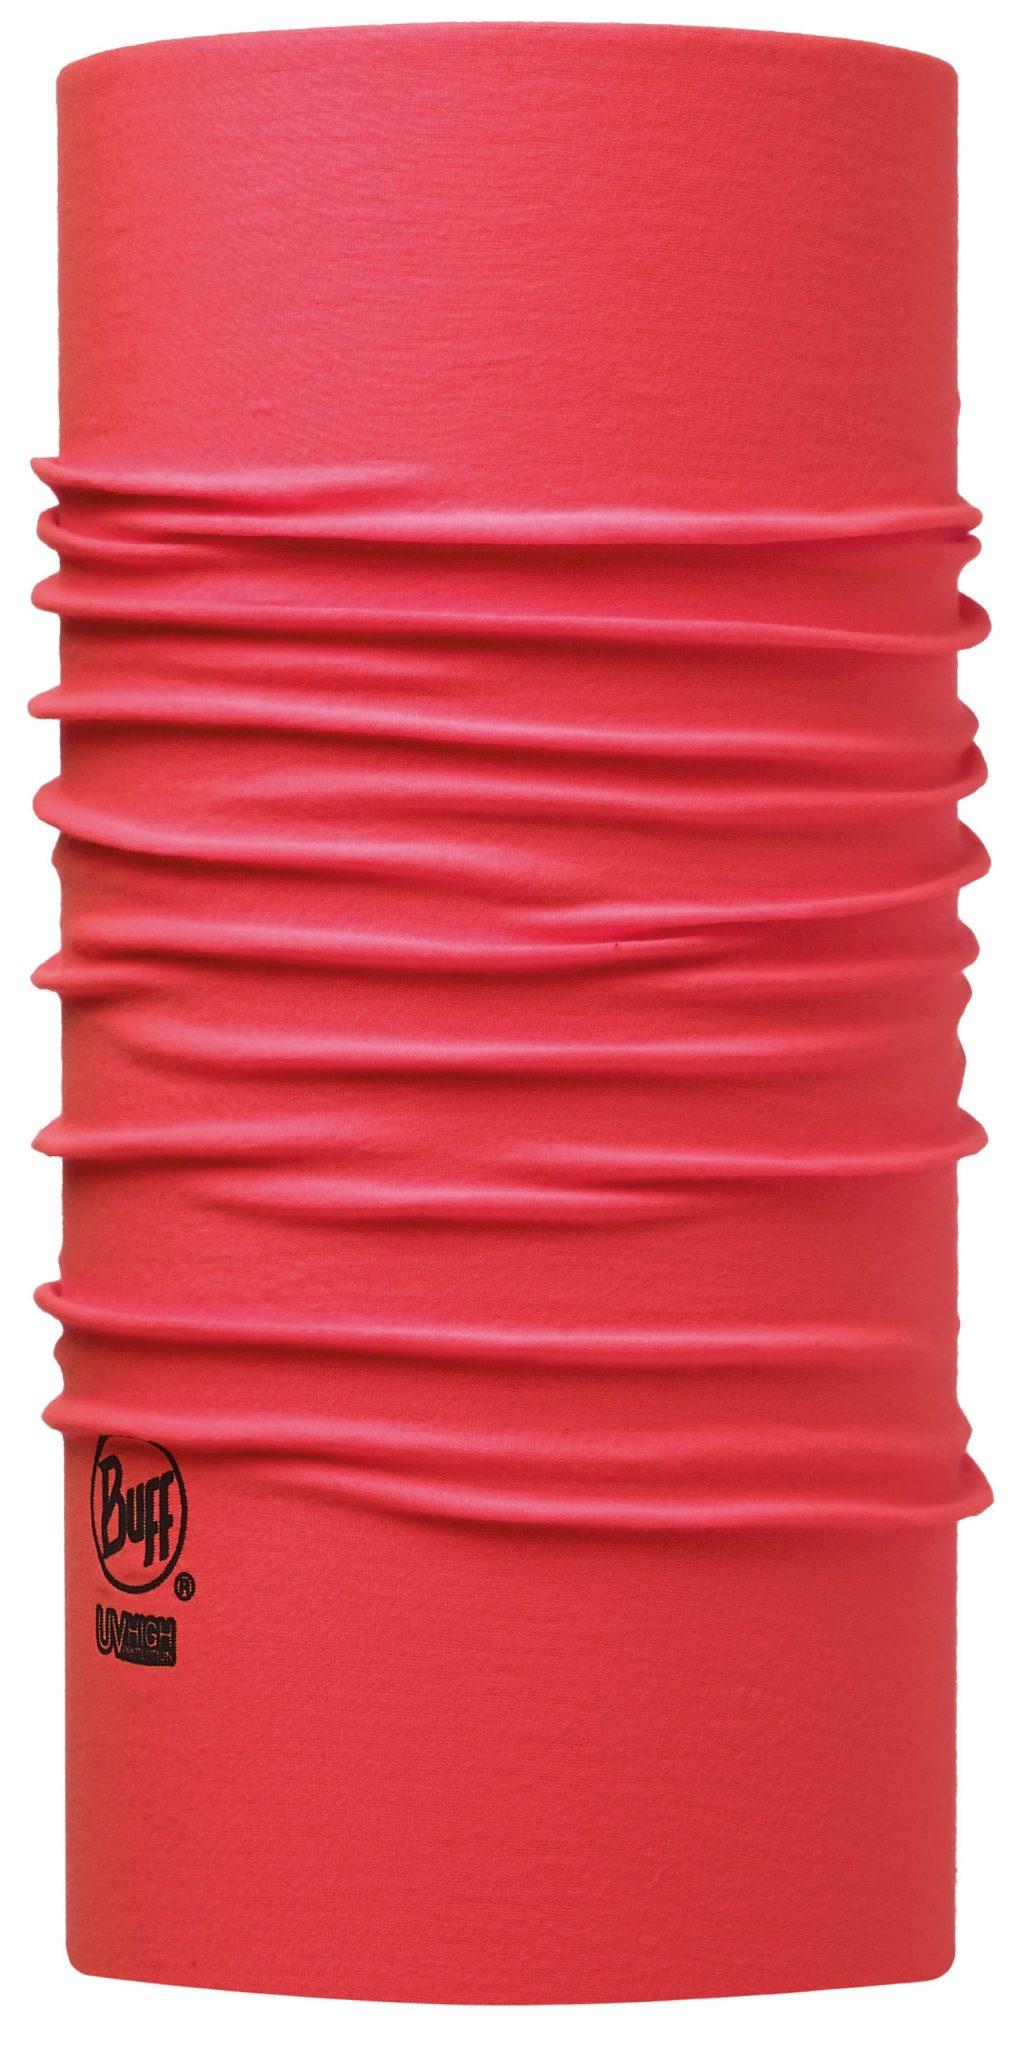 Buff Accessoire »High UV Protection«